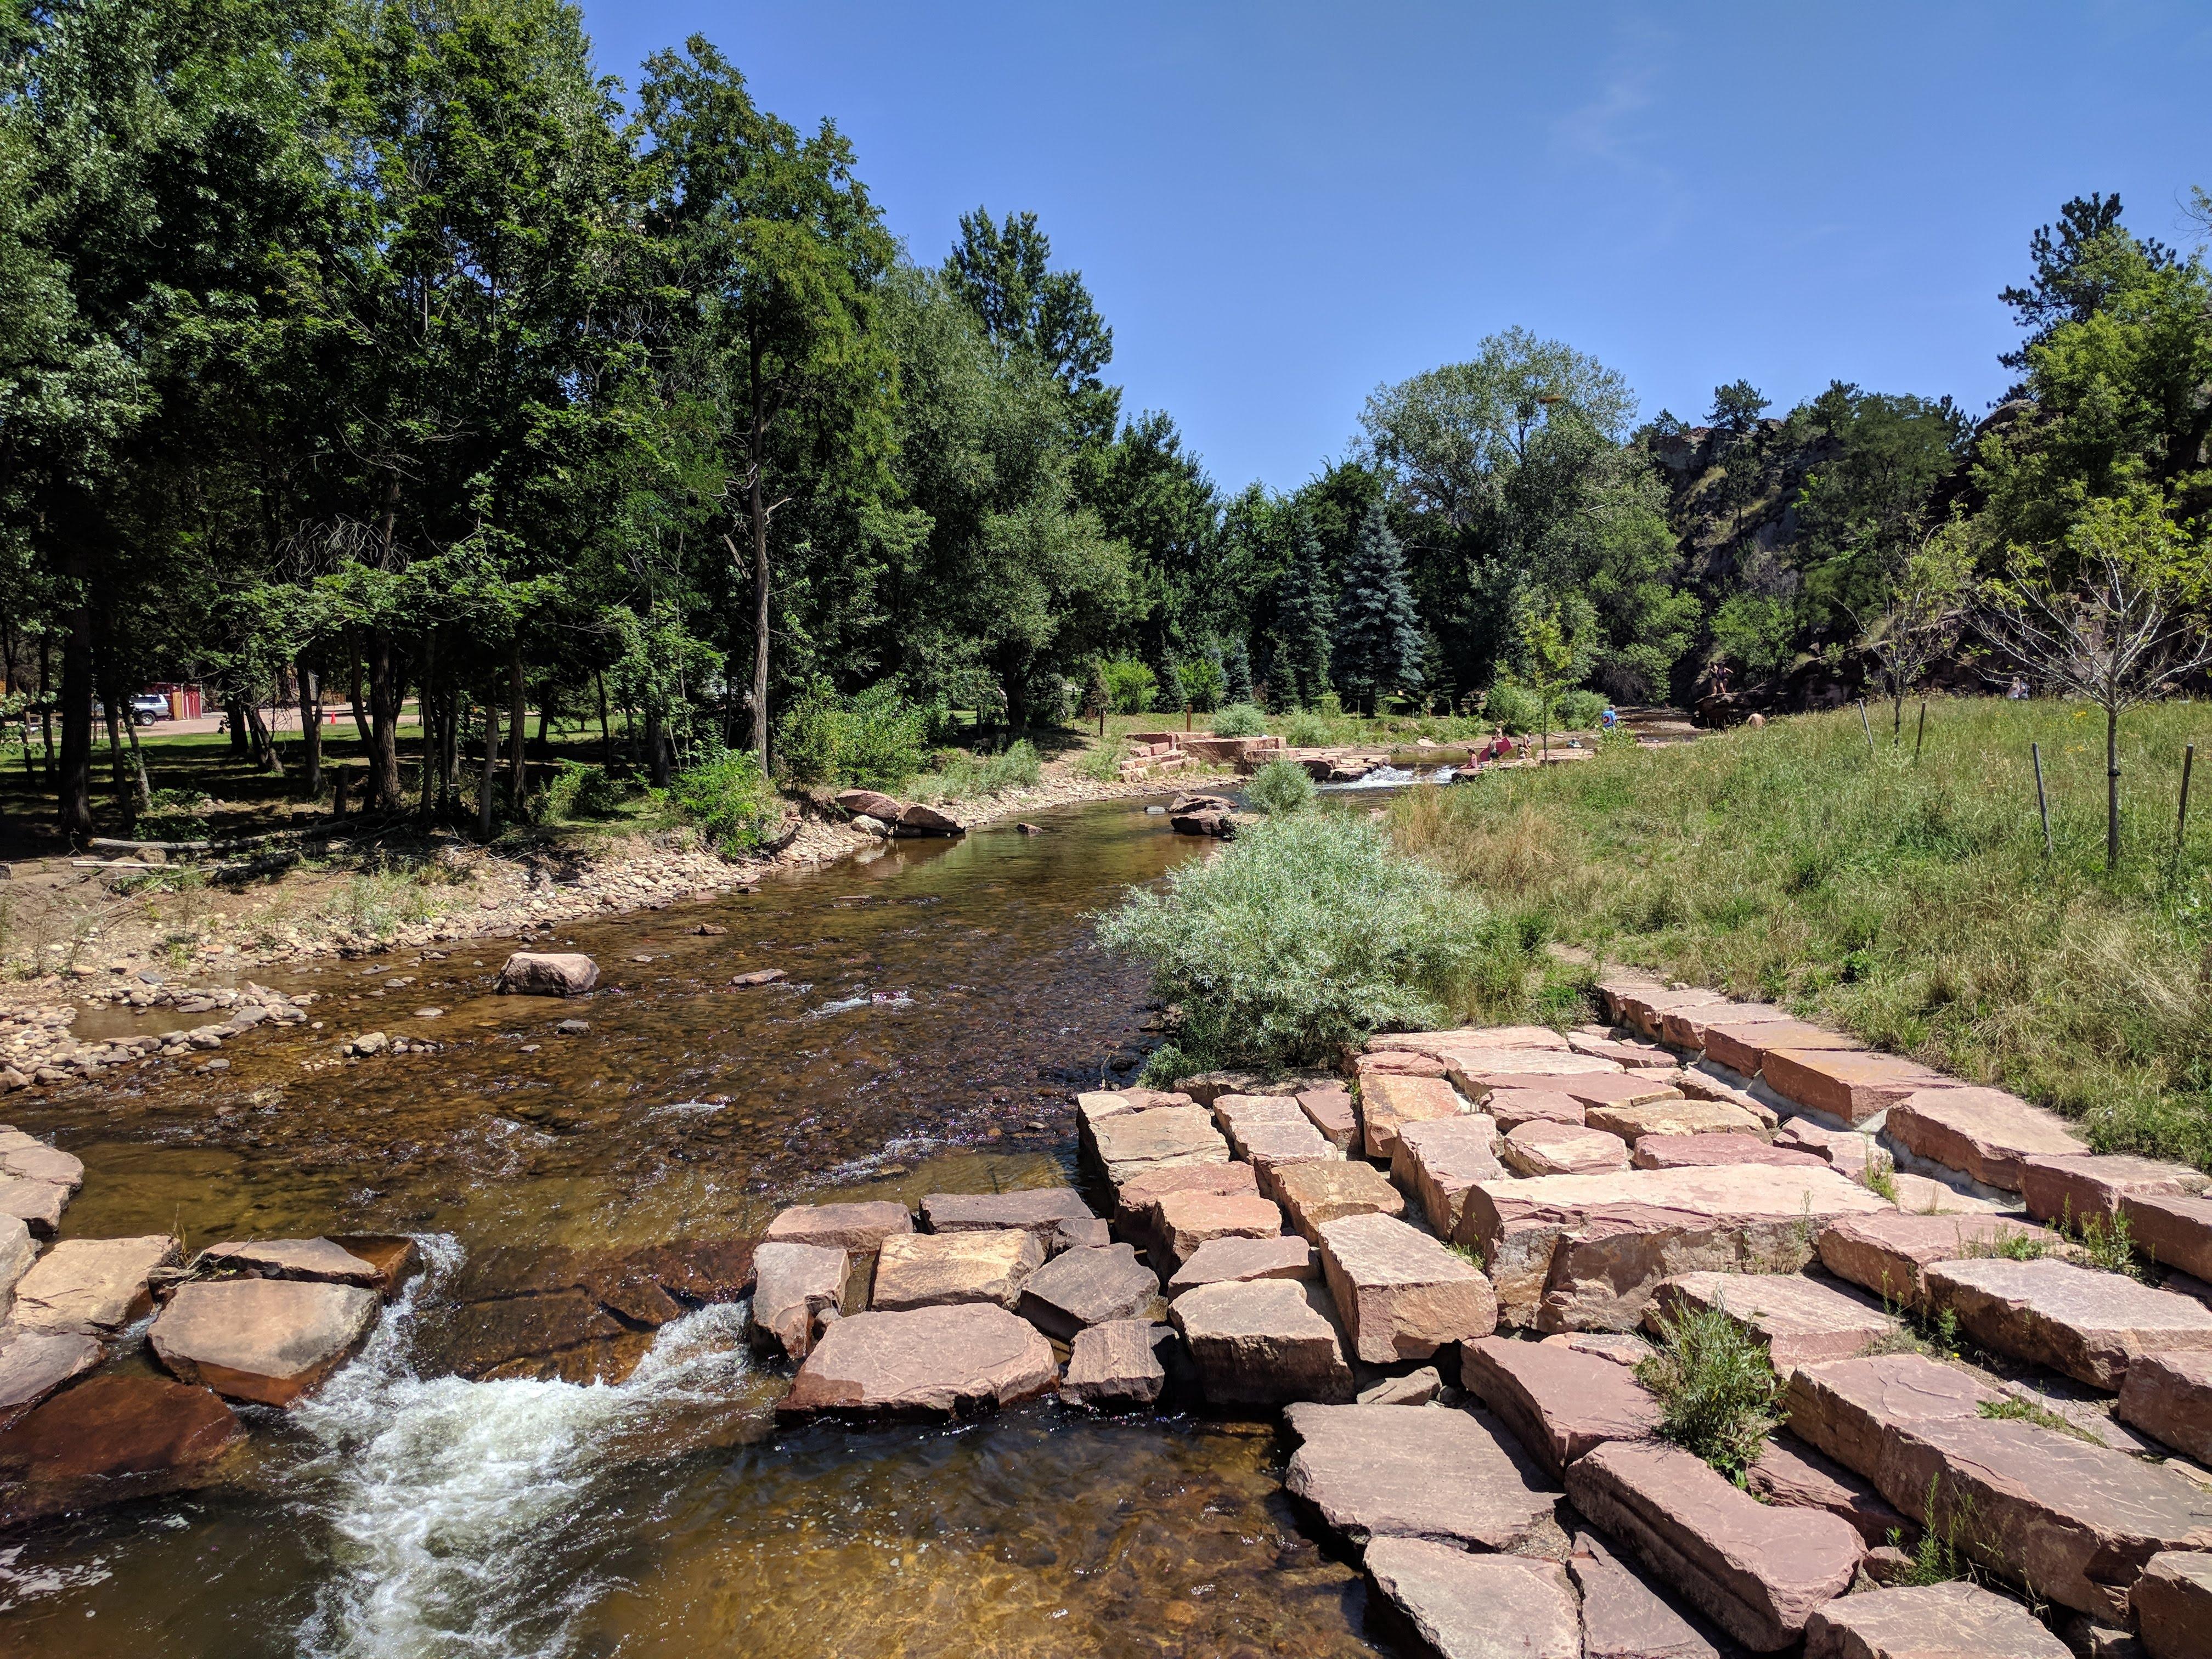 Creek around the park